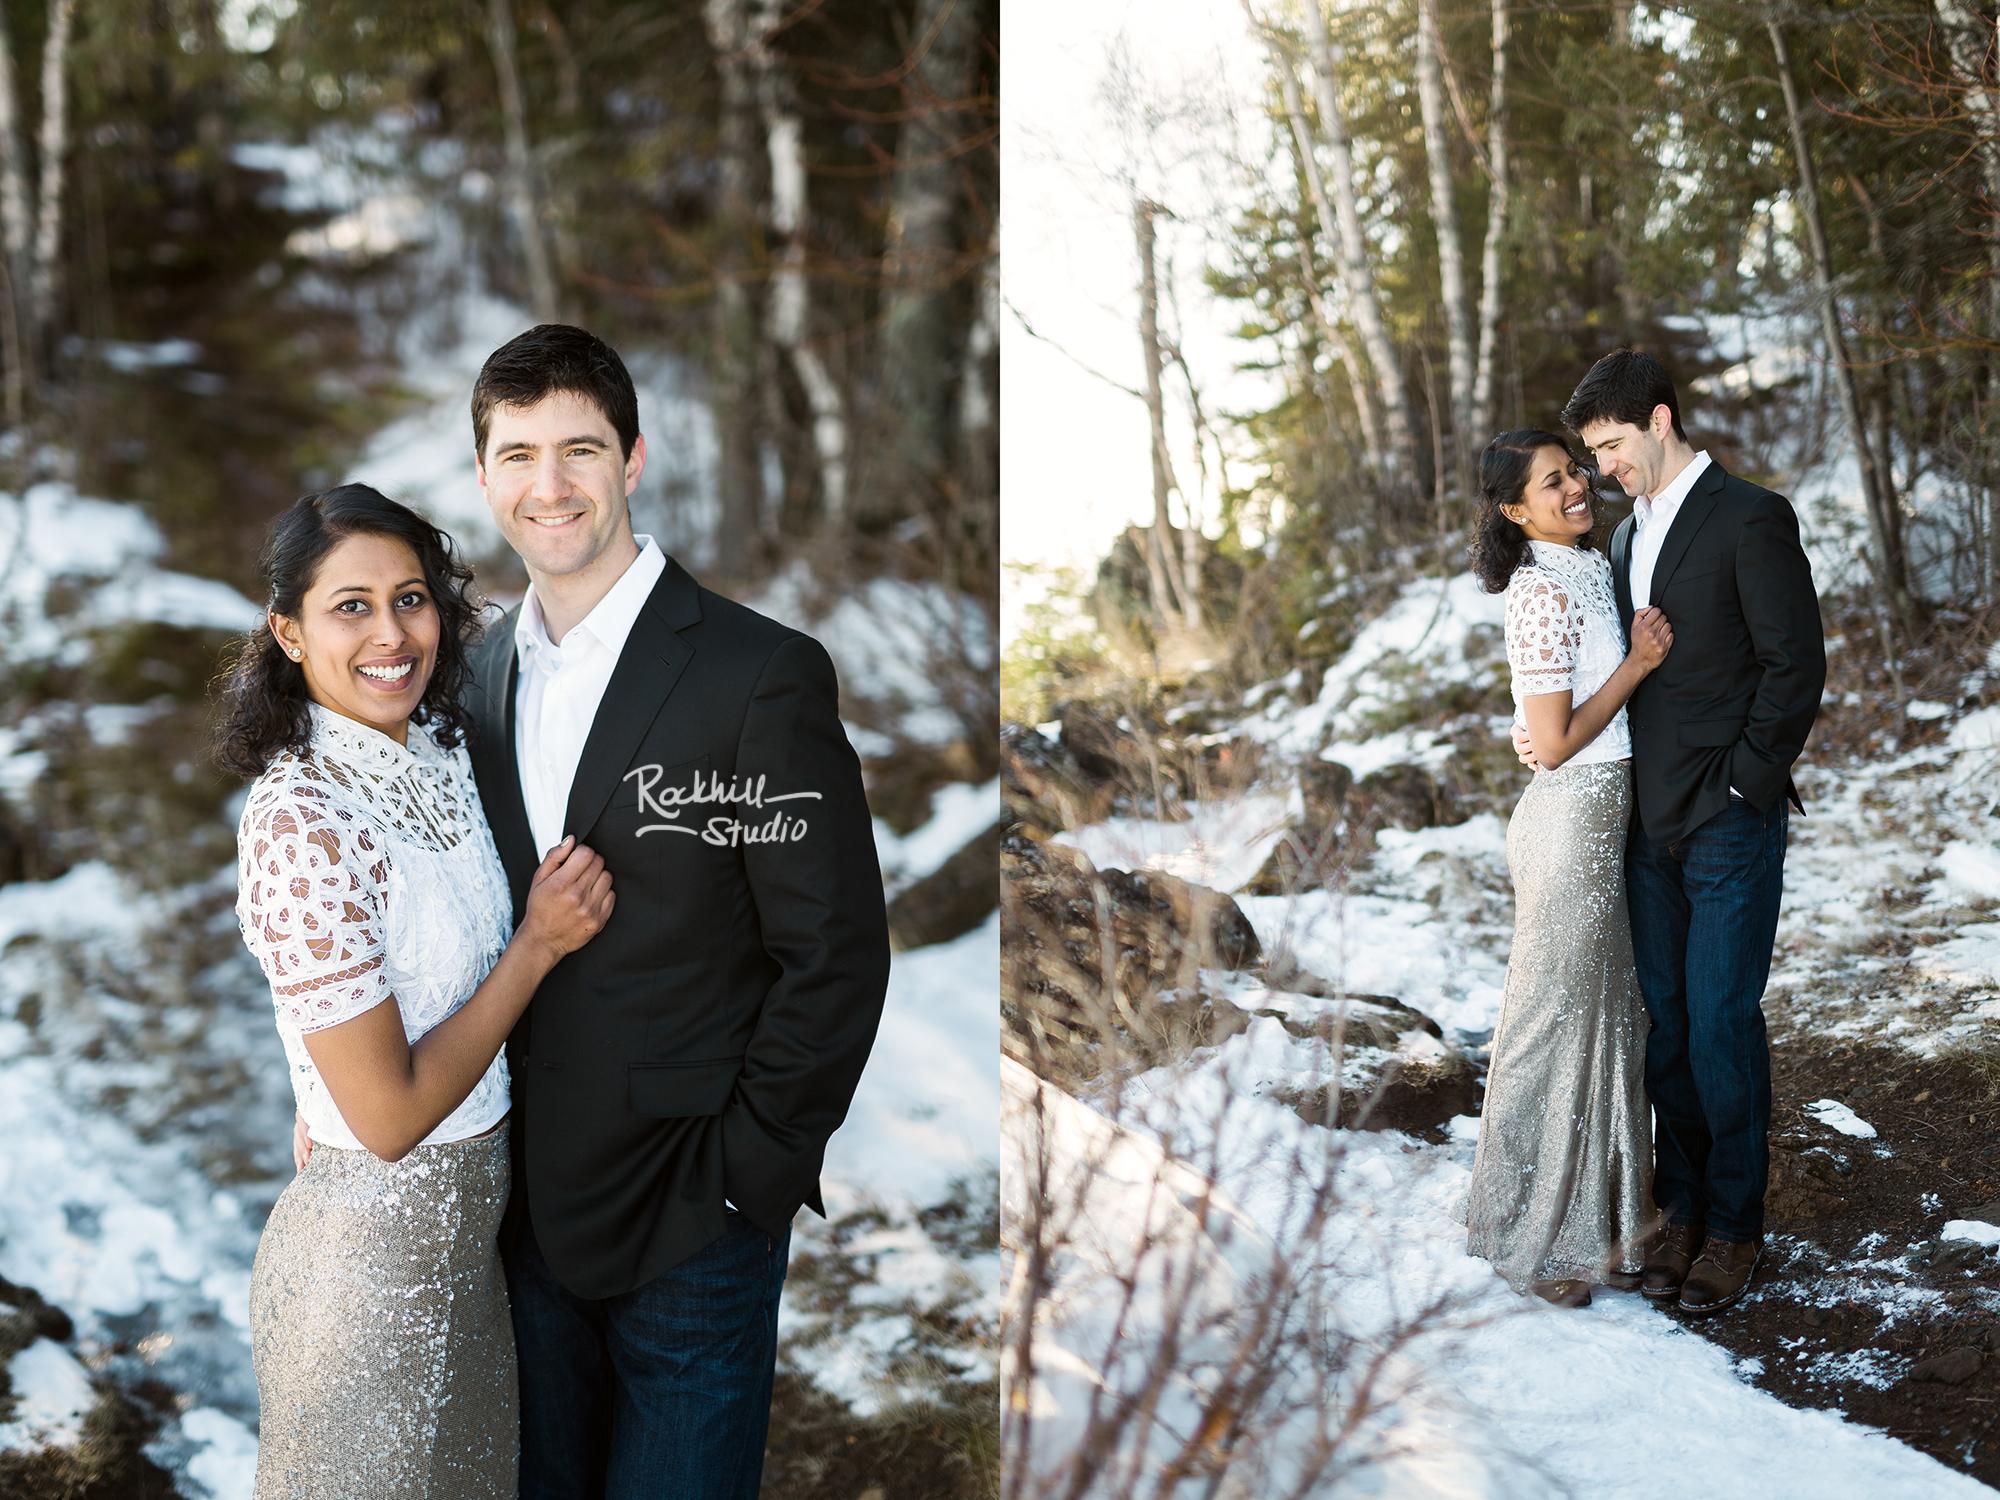 northern-michigan-wedding-marquette-engagement-upper-peninsula-michigan-rockhill-winter-12.jpg